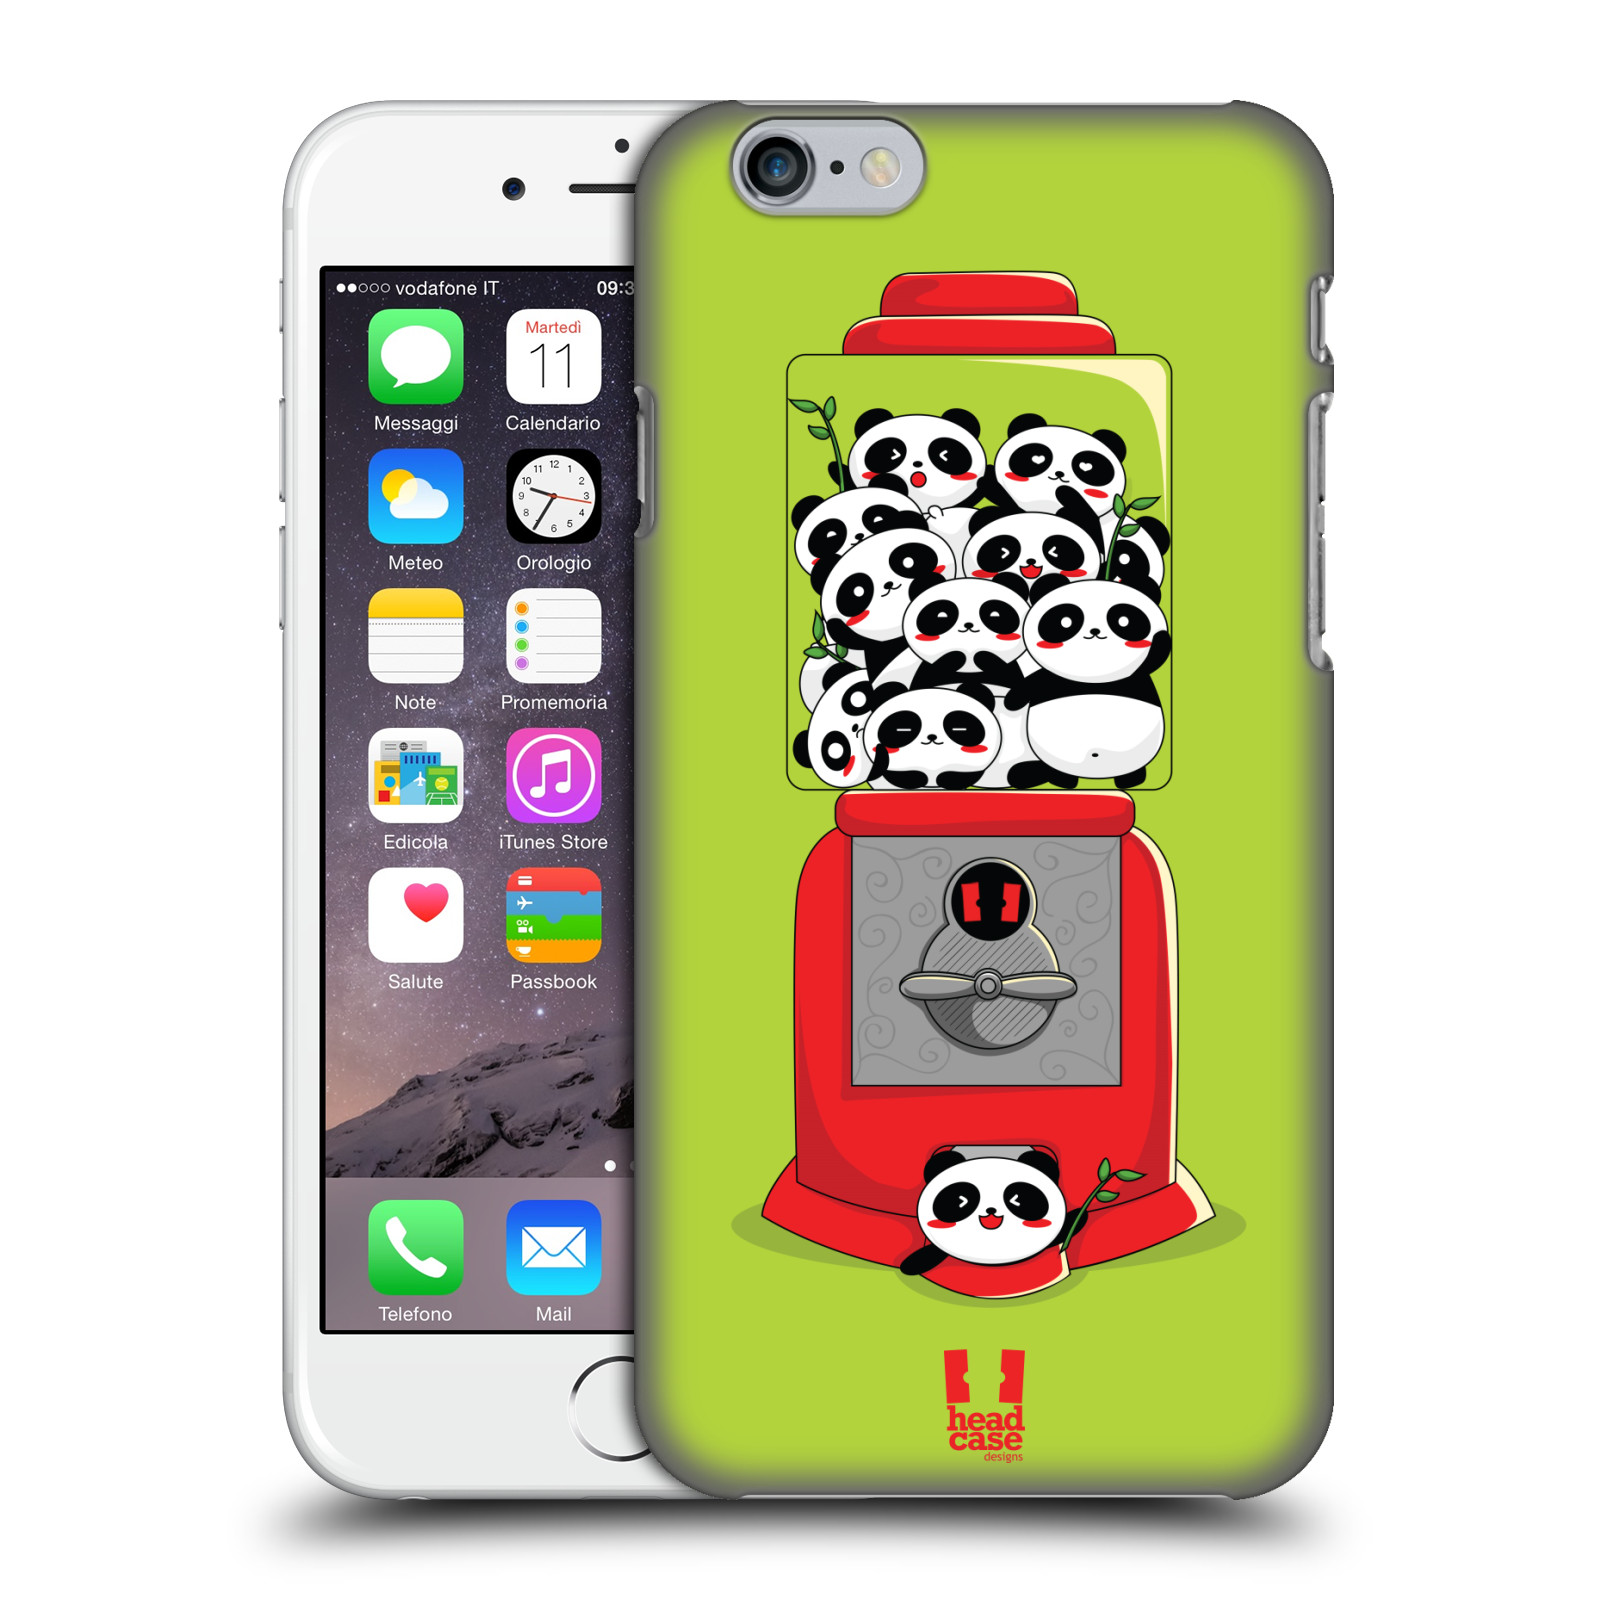 HEAD-CASE-DESIGNS-KAWAII-MACHINE-HARD-BACK-CASE-FOR-APPLE-iPHONE-PHONES